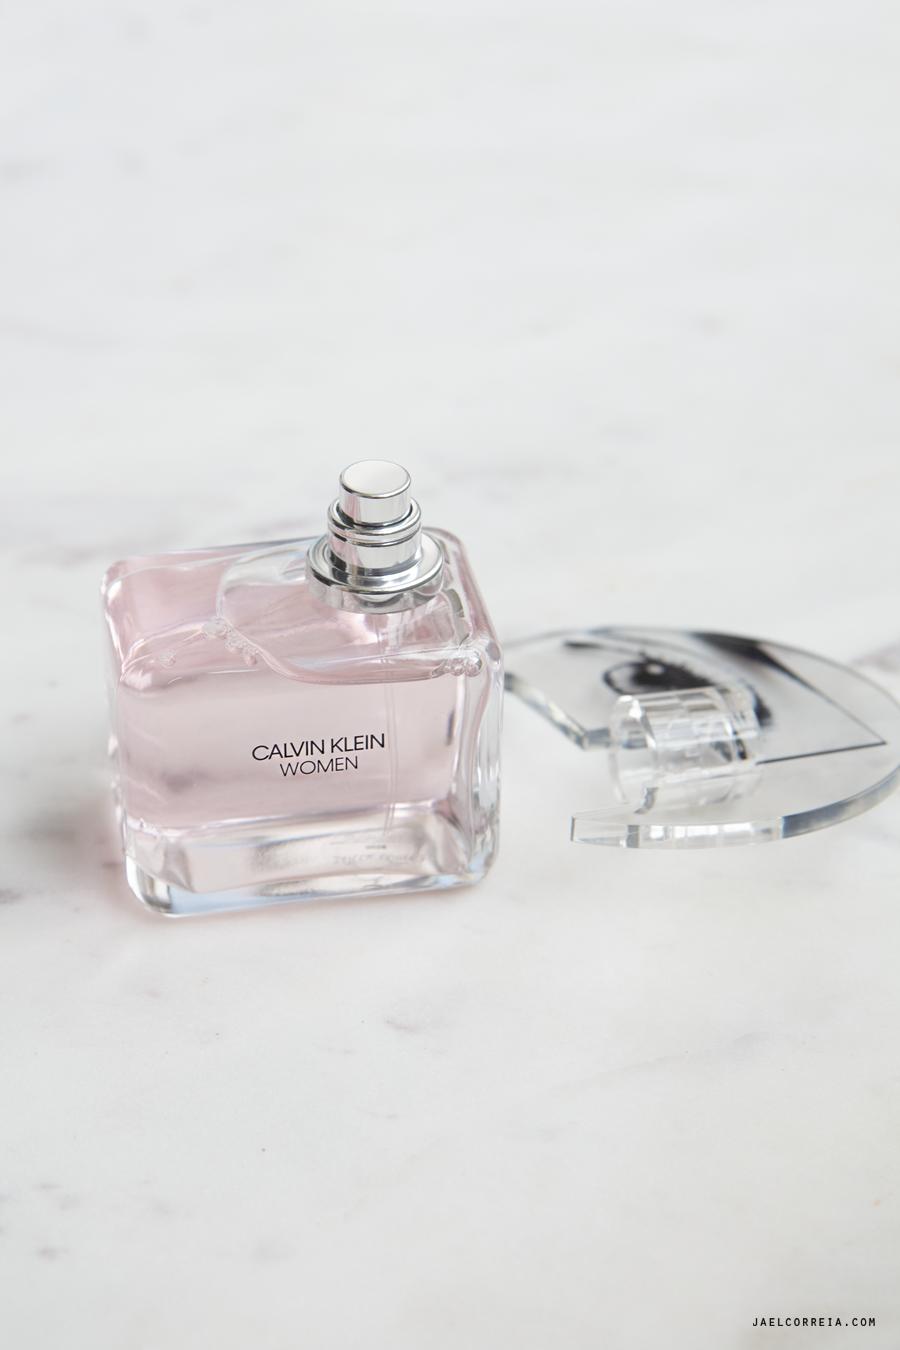 CK women Calvin Klein women eau de parfum perfume review jael correia portugal notino perfumes baratos originais femininos